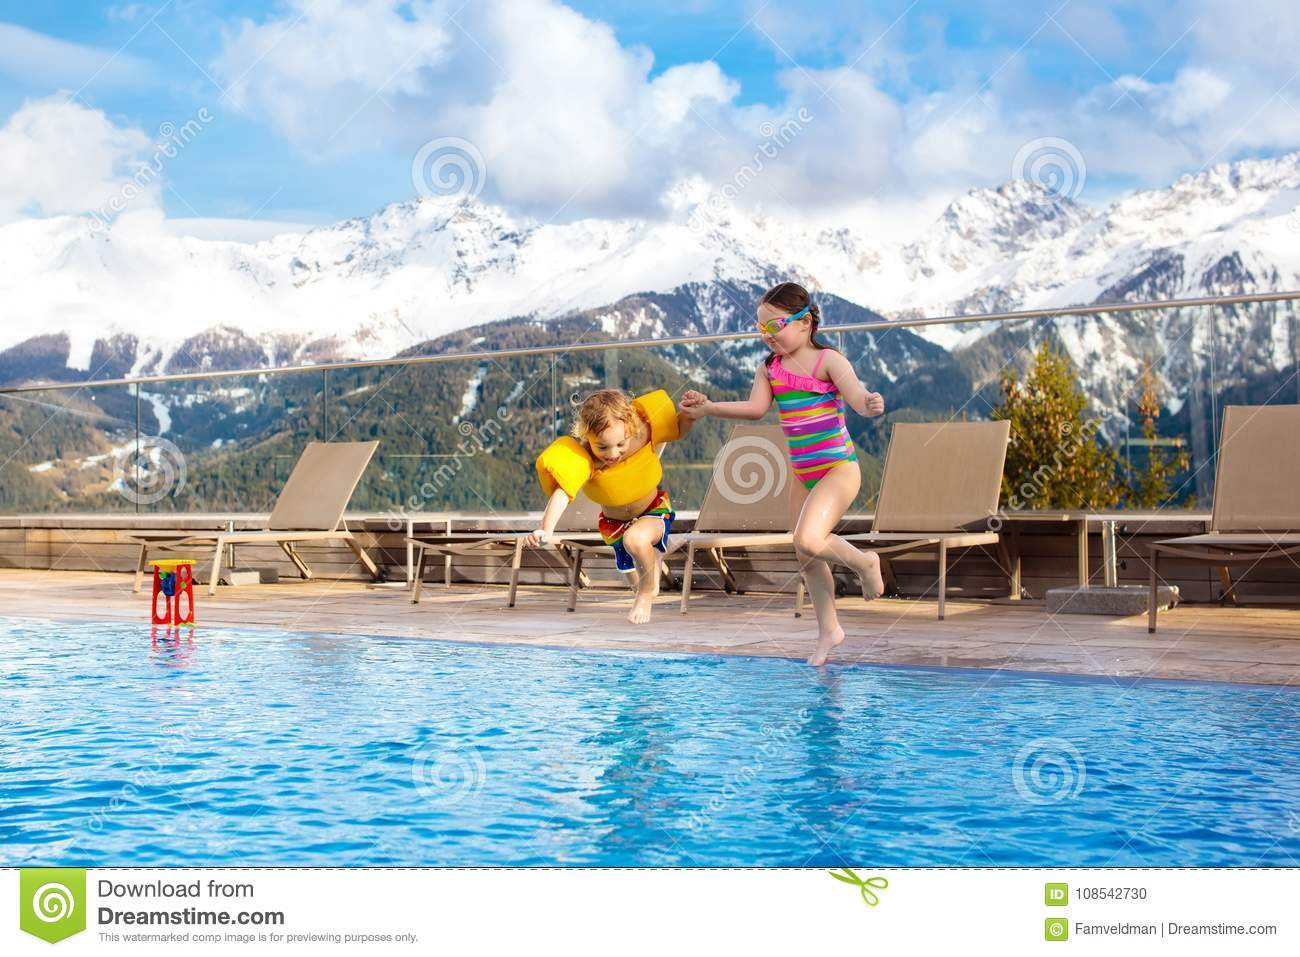 Kids Outdoor Swimming Pool  Kids In Outdoor Swimming Pool Alpine Resort Stock